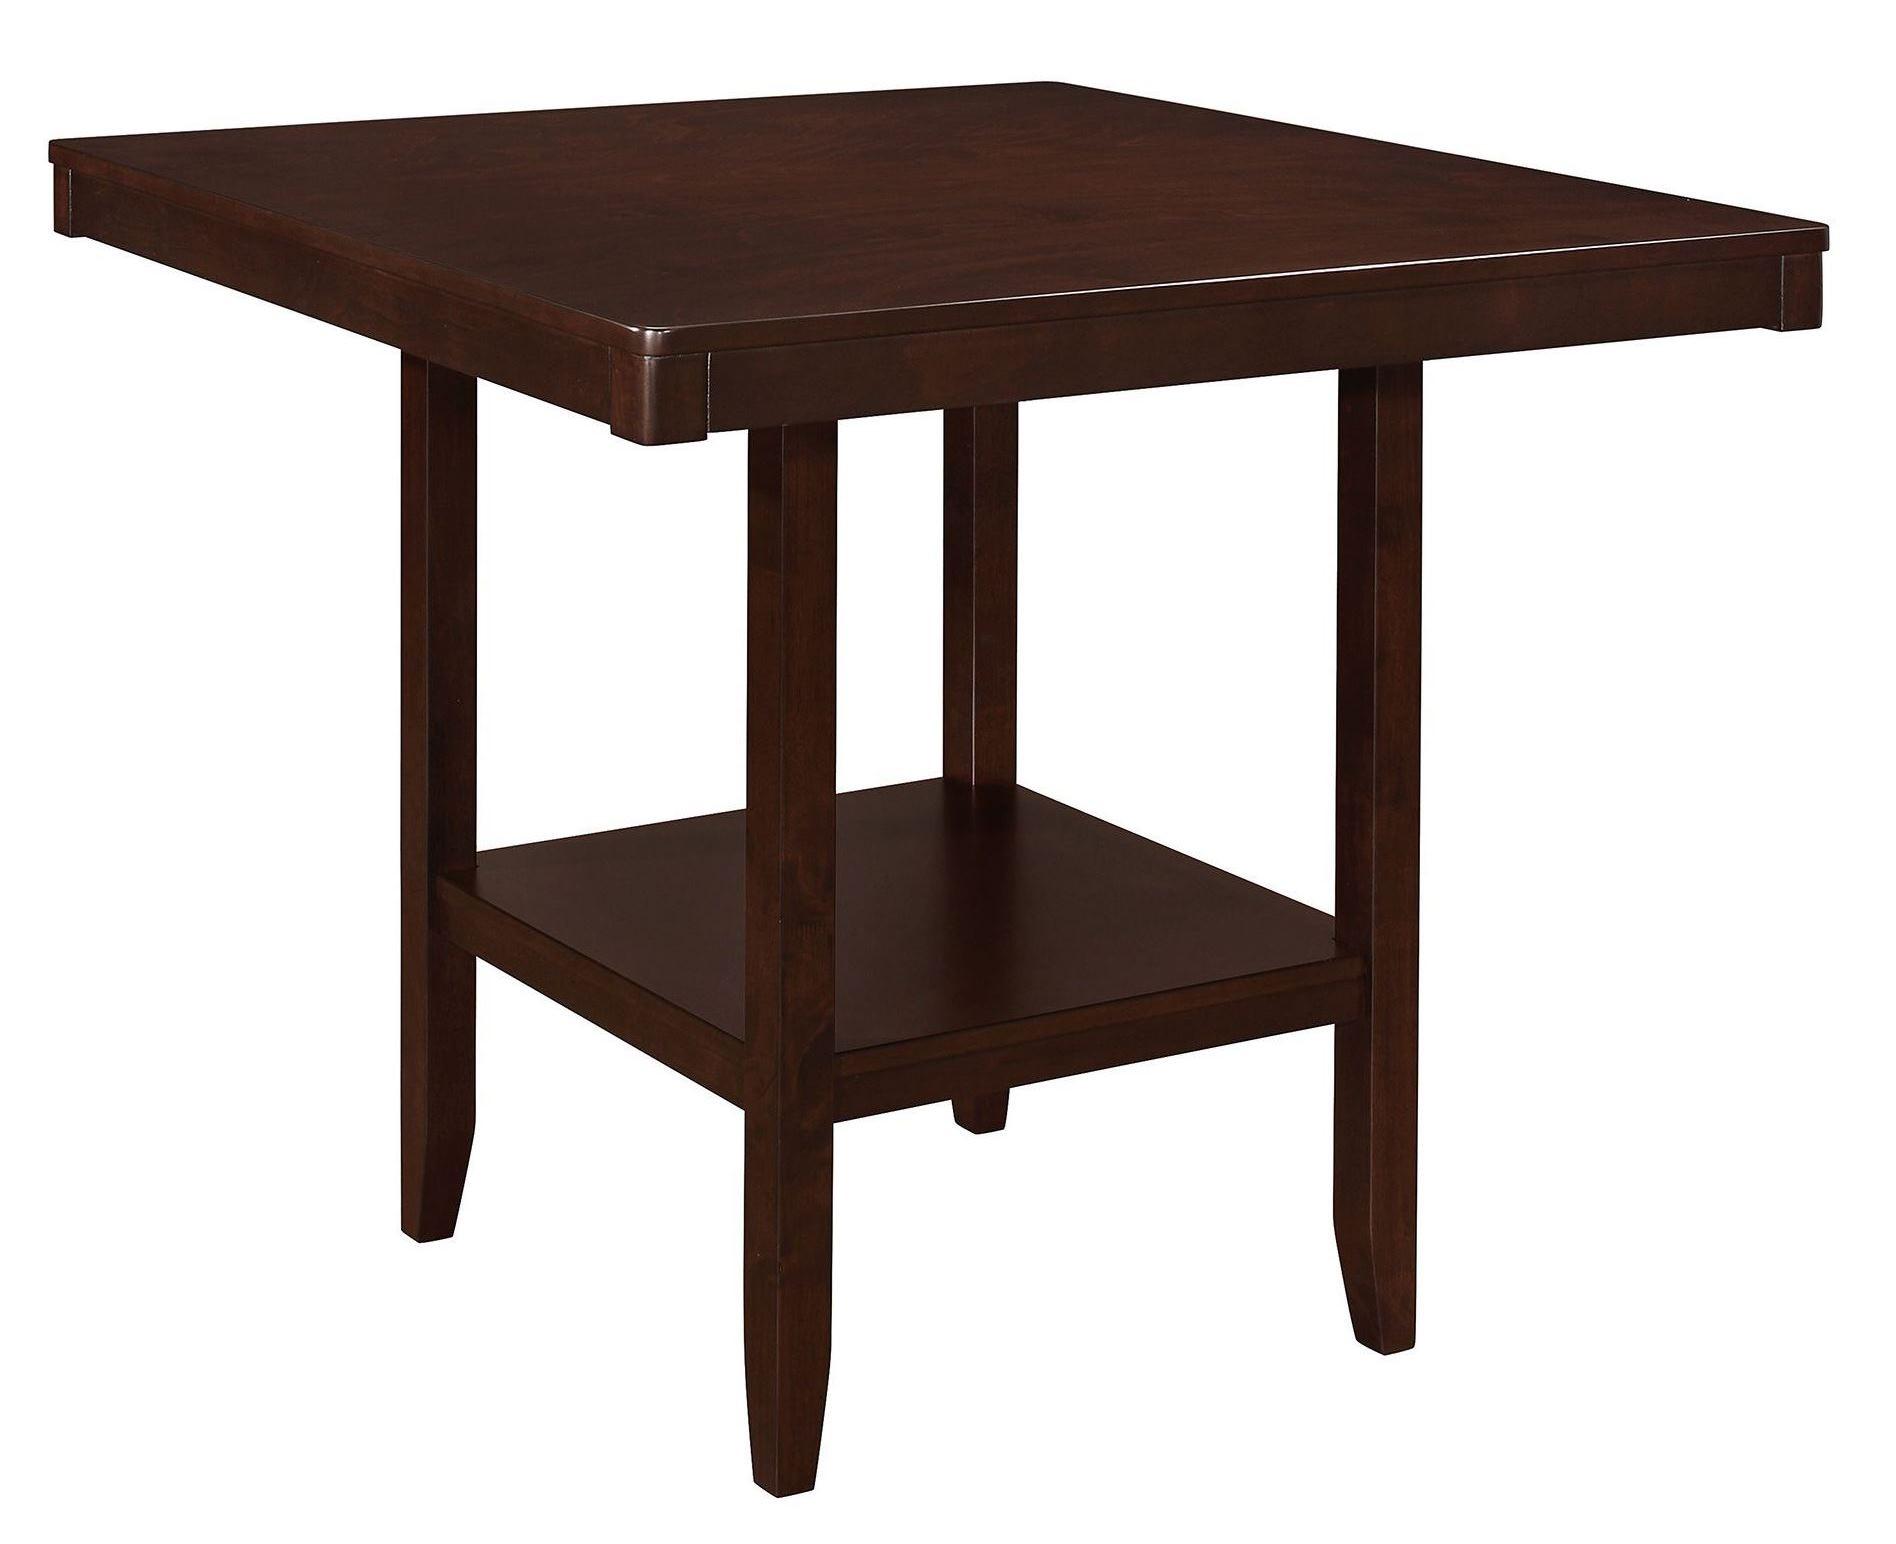 Fattori Espresso Counter Height Dining Table From Coaster